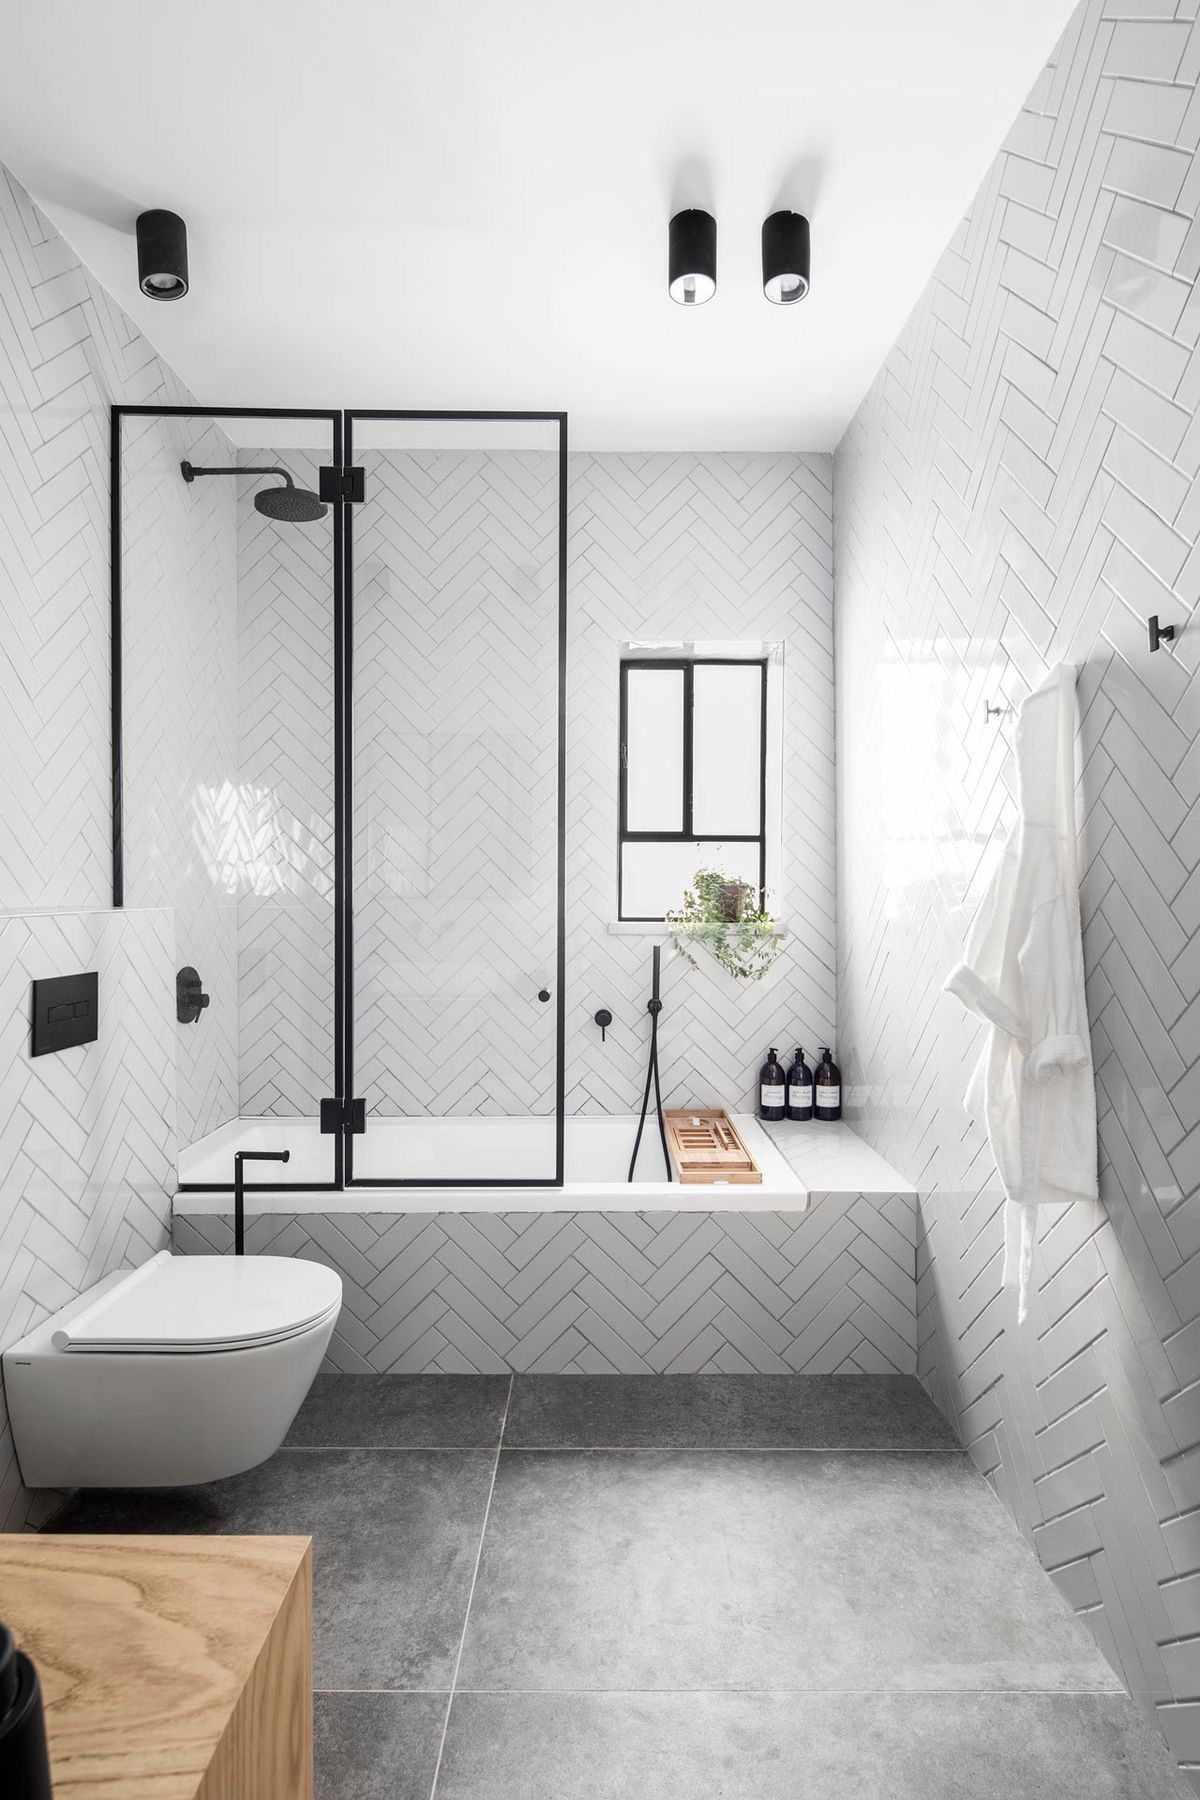 Pin By Jenny Hrund On Interiors Bathroom Interior Design Modern Bathroom Design Bathroom Design